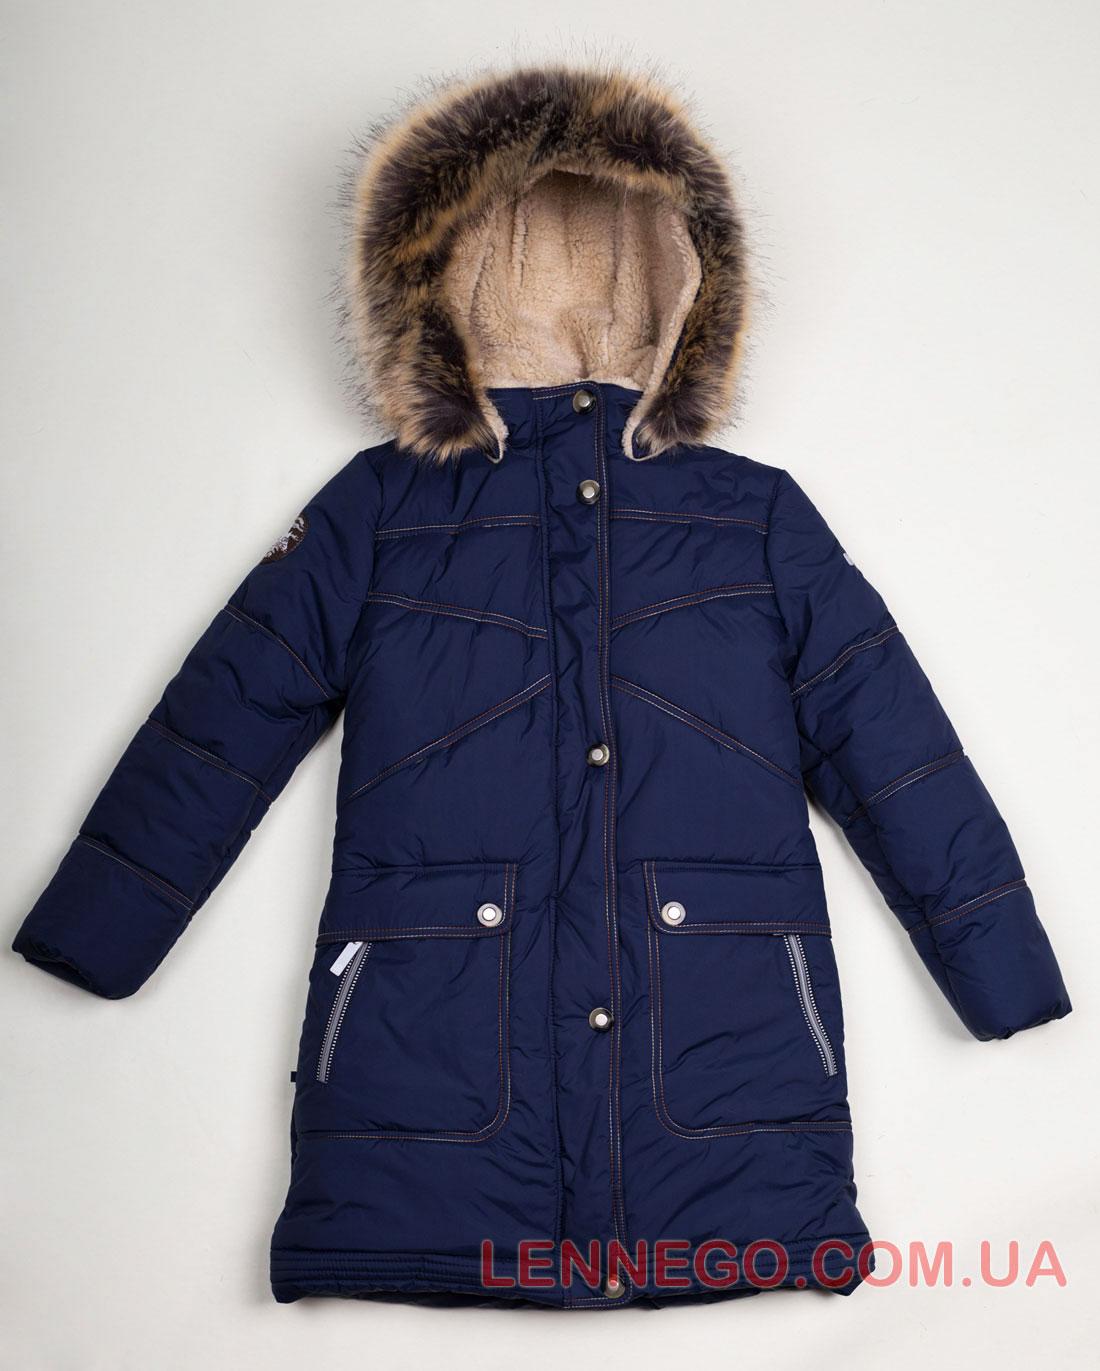 Lenne Isadora пальто для девочки синие